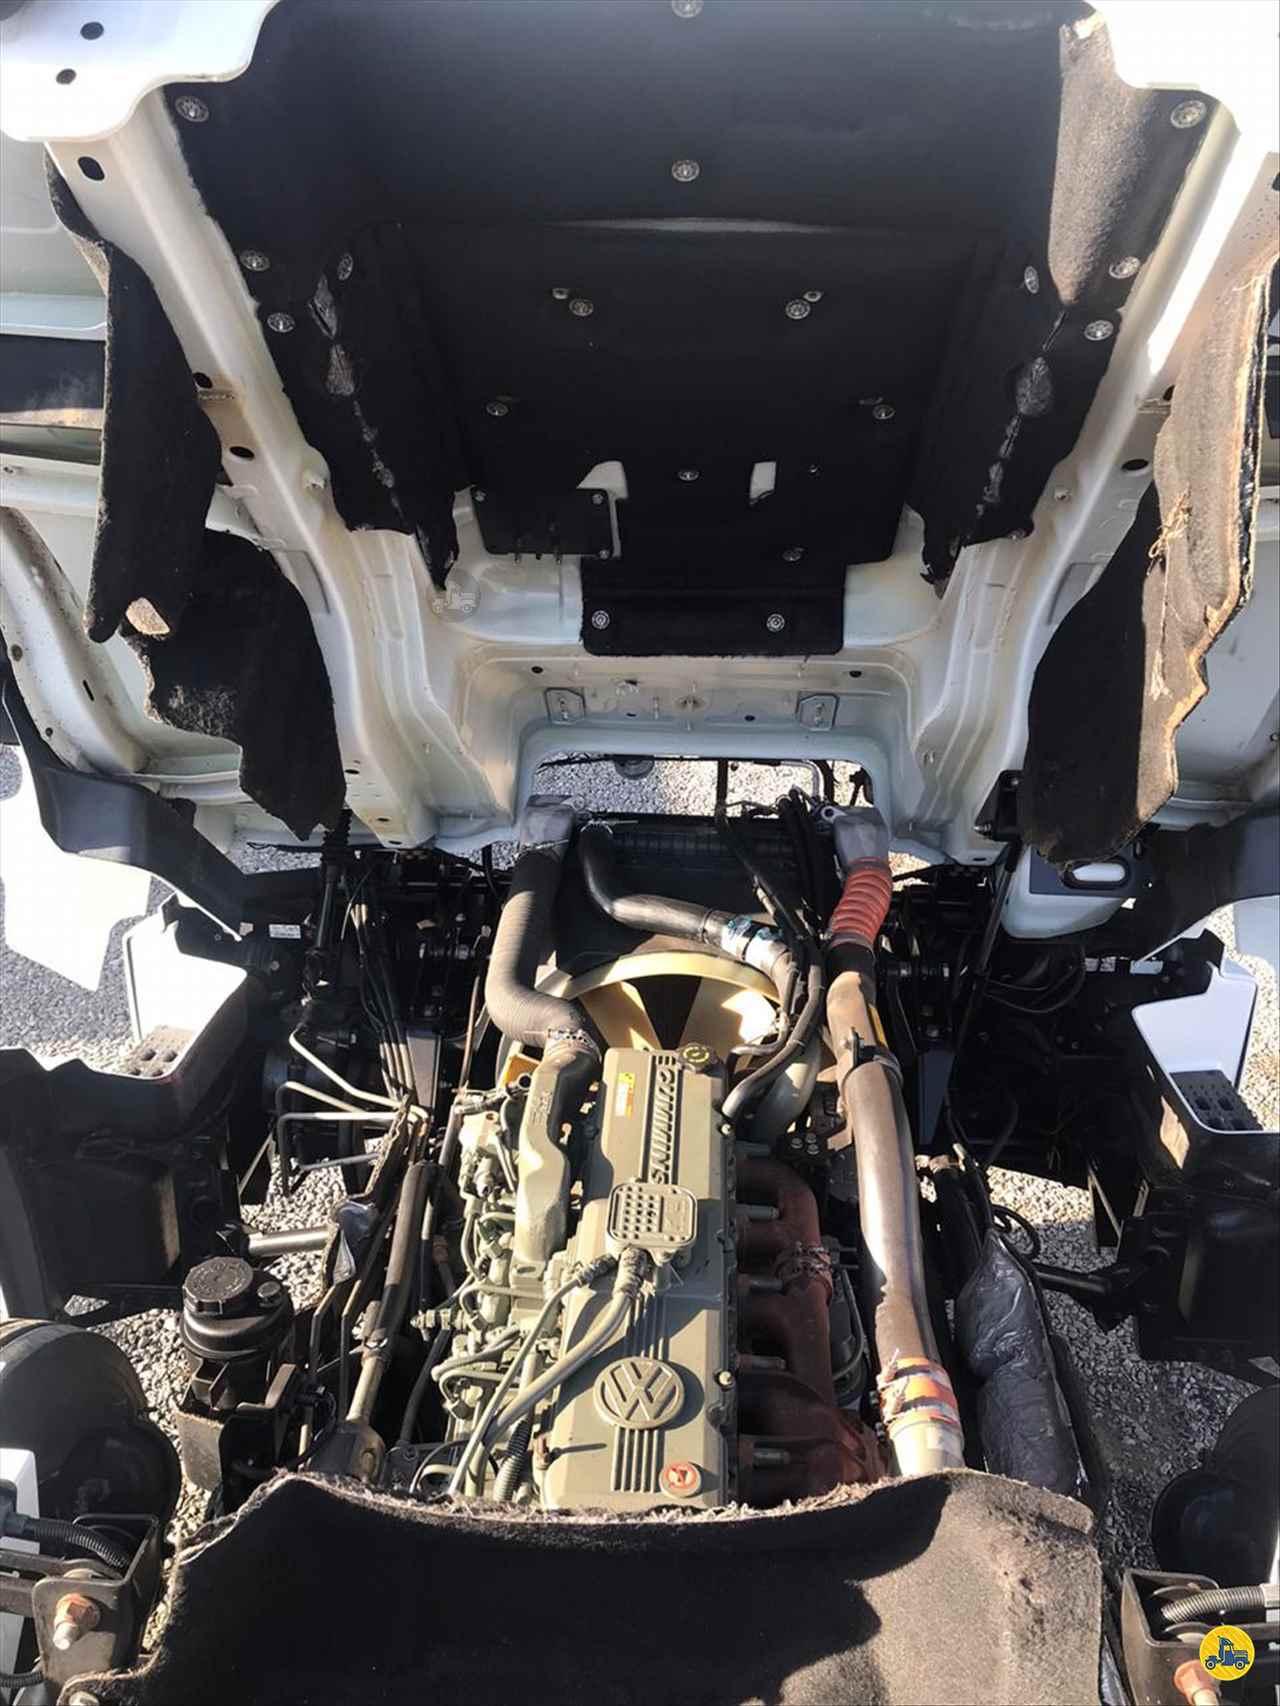 VOLKSWAGEN VW 30330 350km 2016/2017 Prime Caminhões